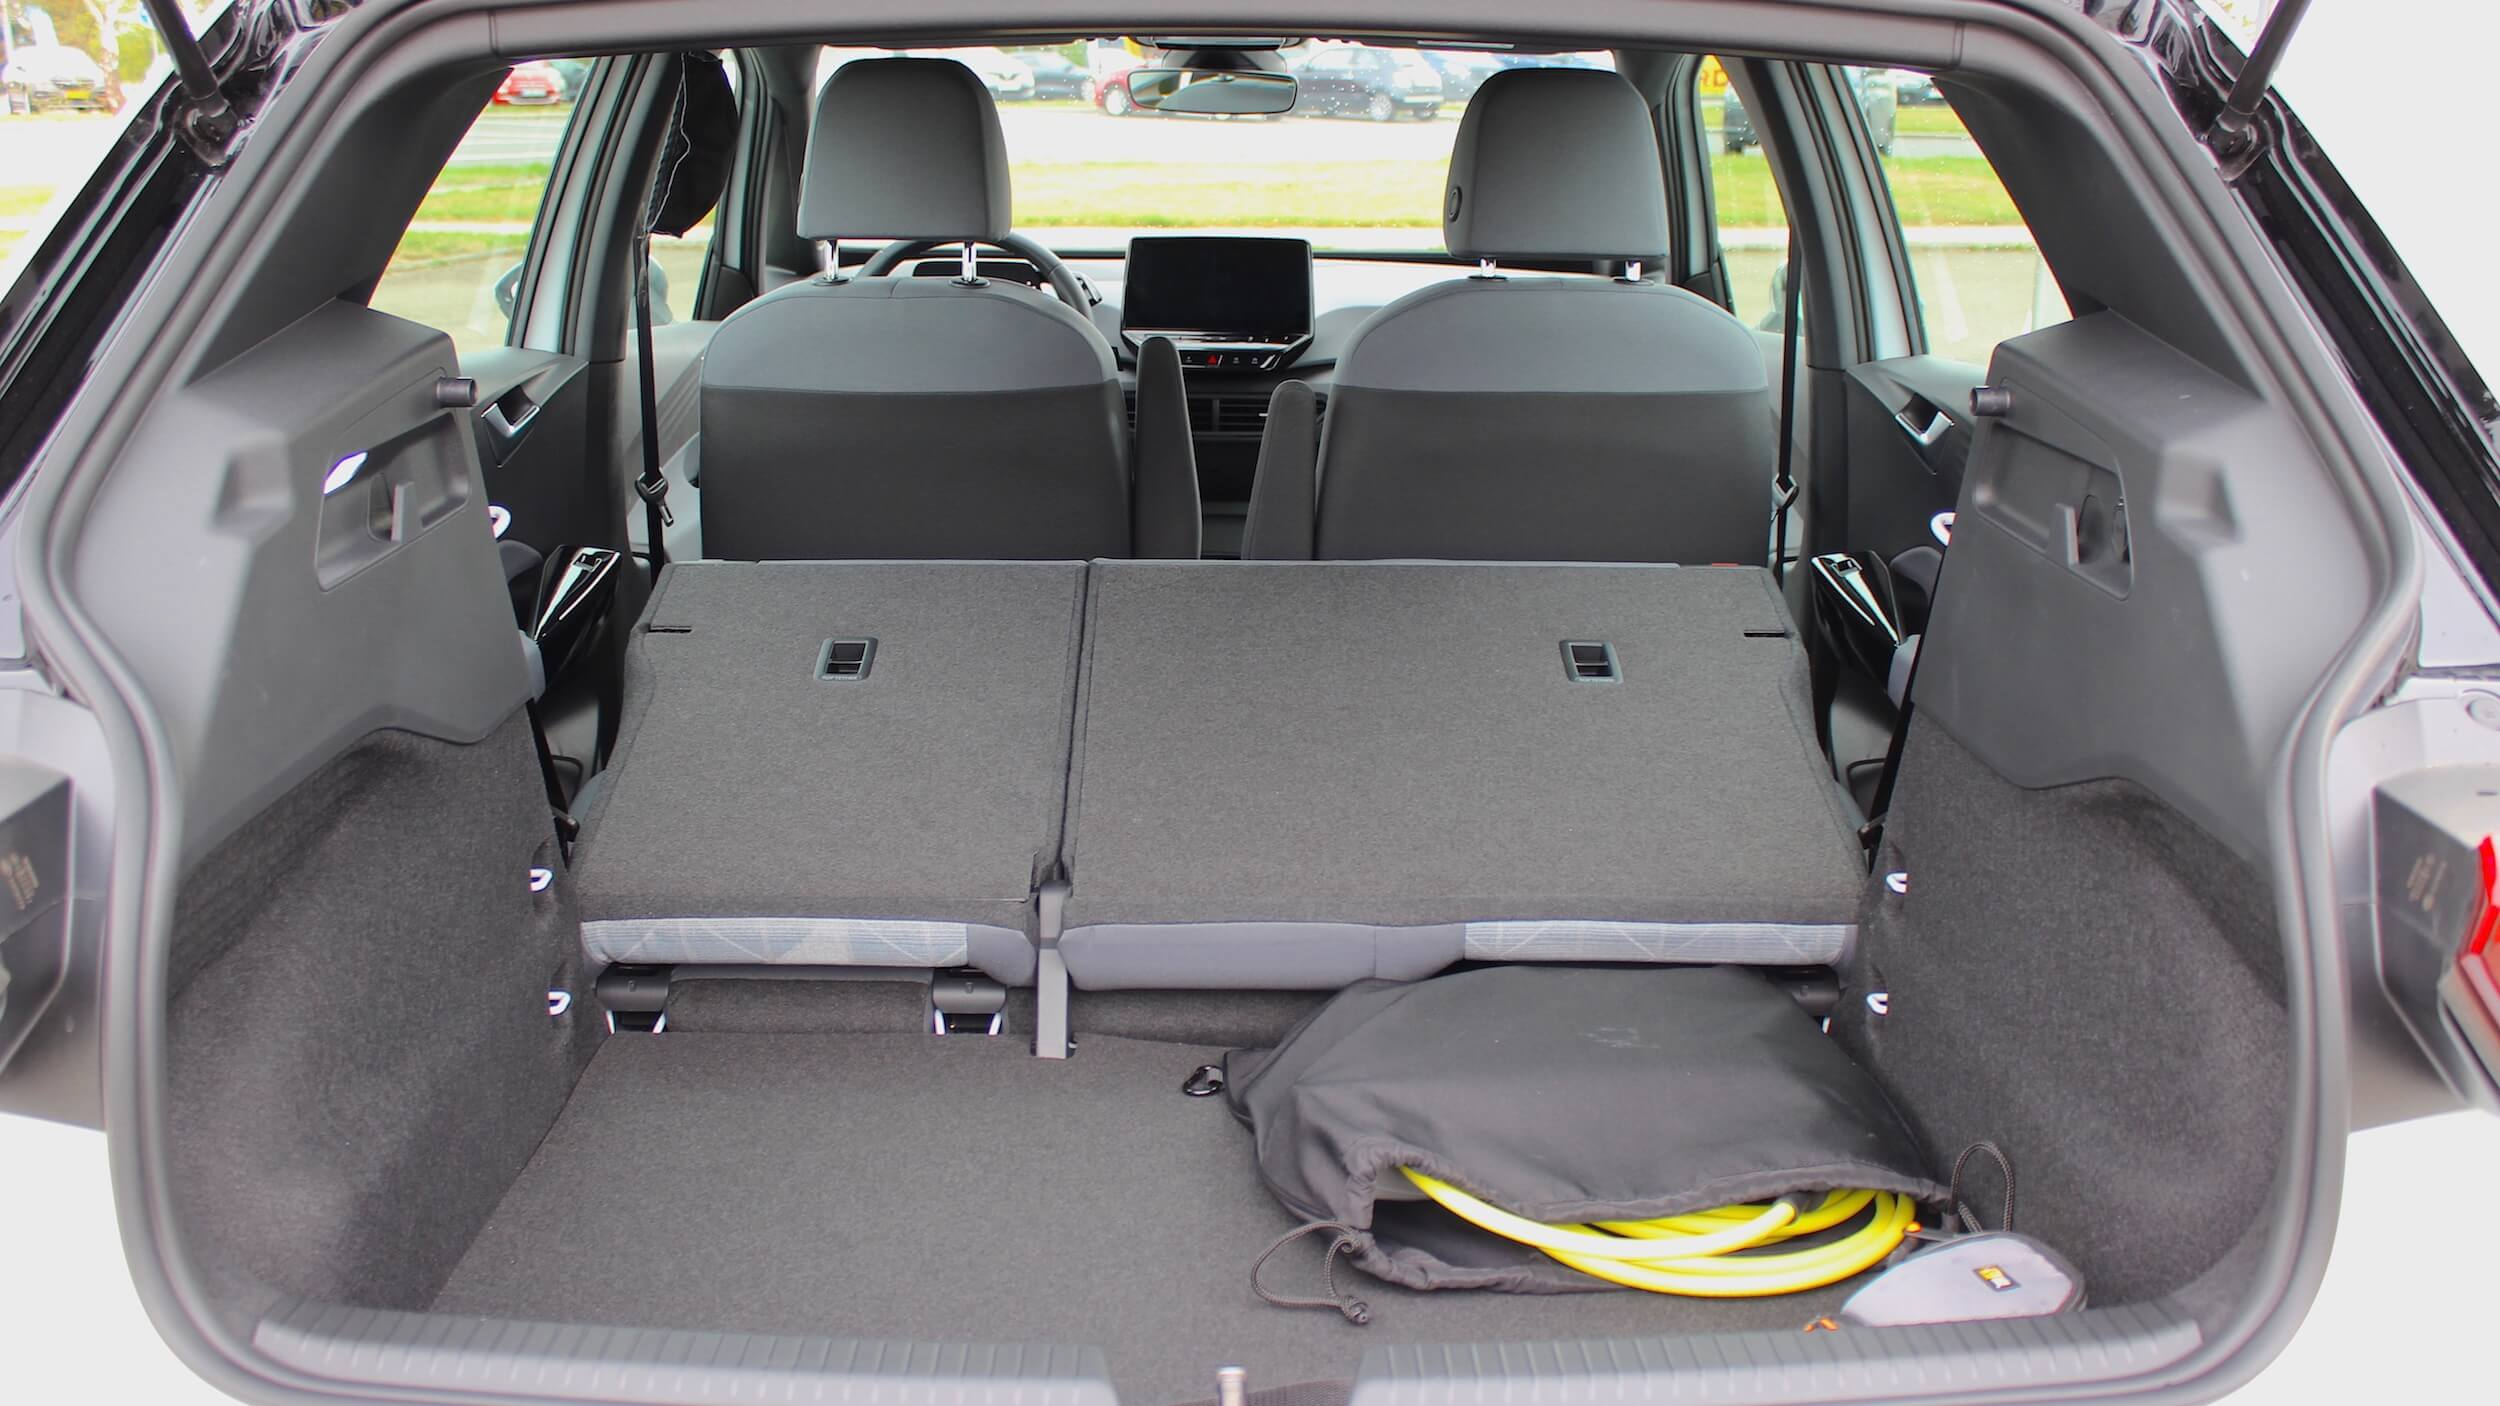 Volkswagen ID.3 koffer met achterbank neergeklapt